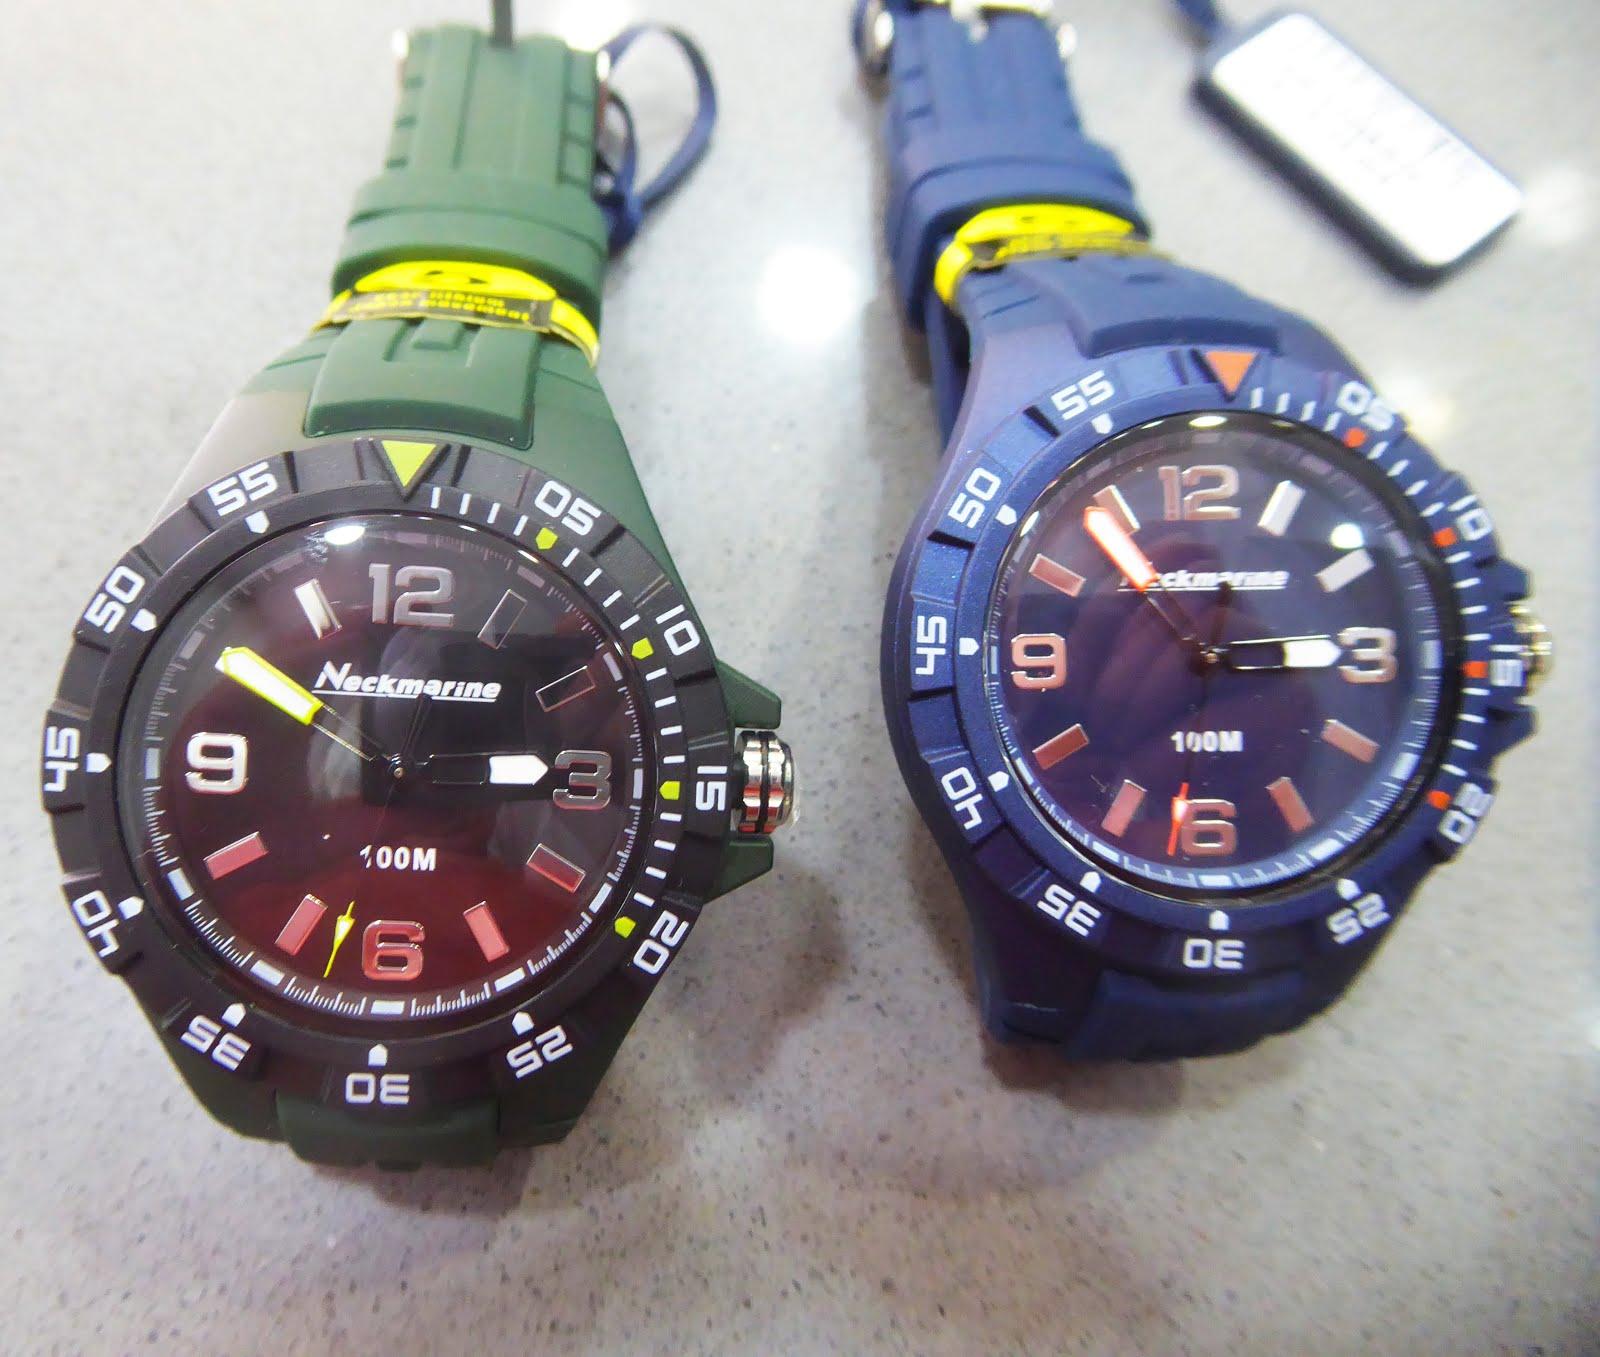 Nuevos relojes Neckmarine